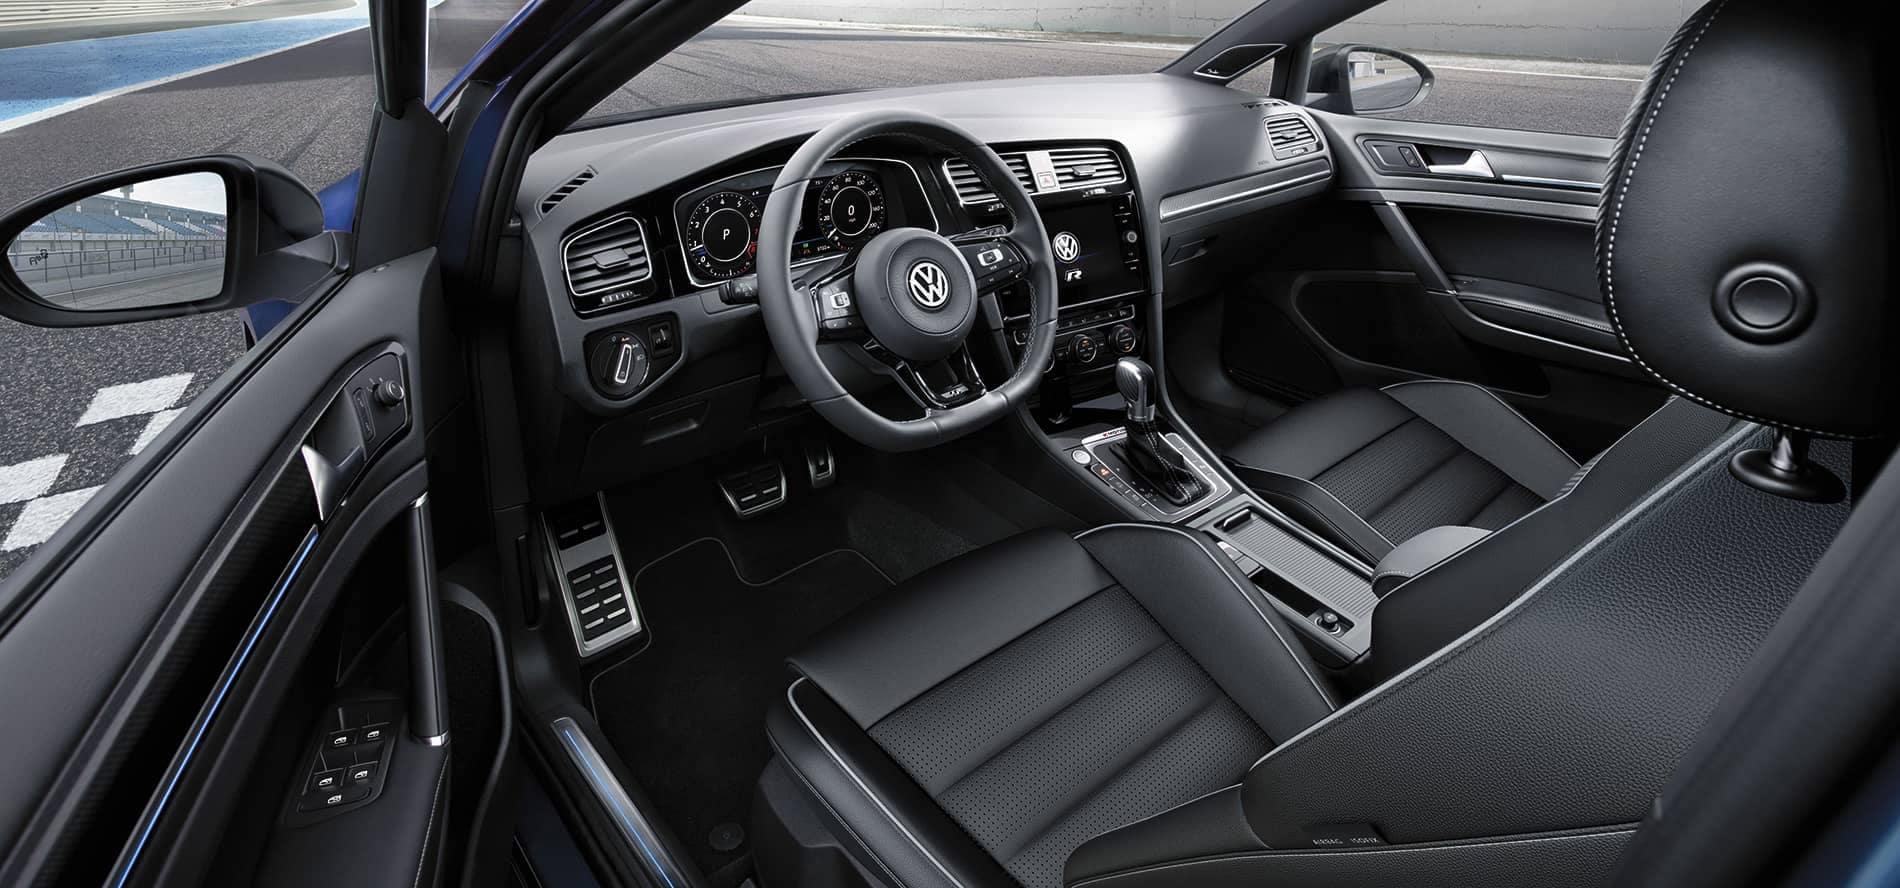 2019-GolfR-interior VW Volkwagen